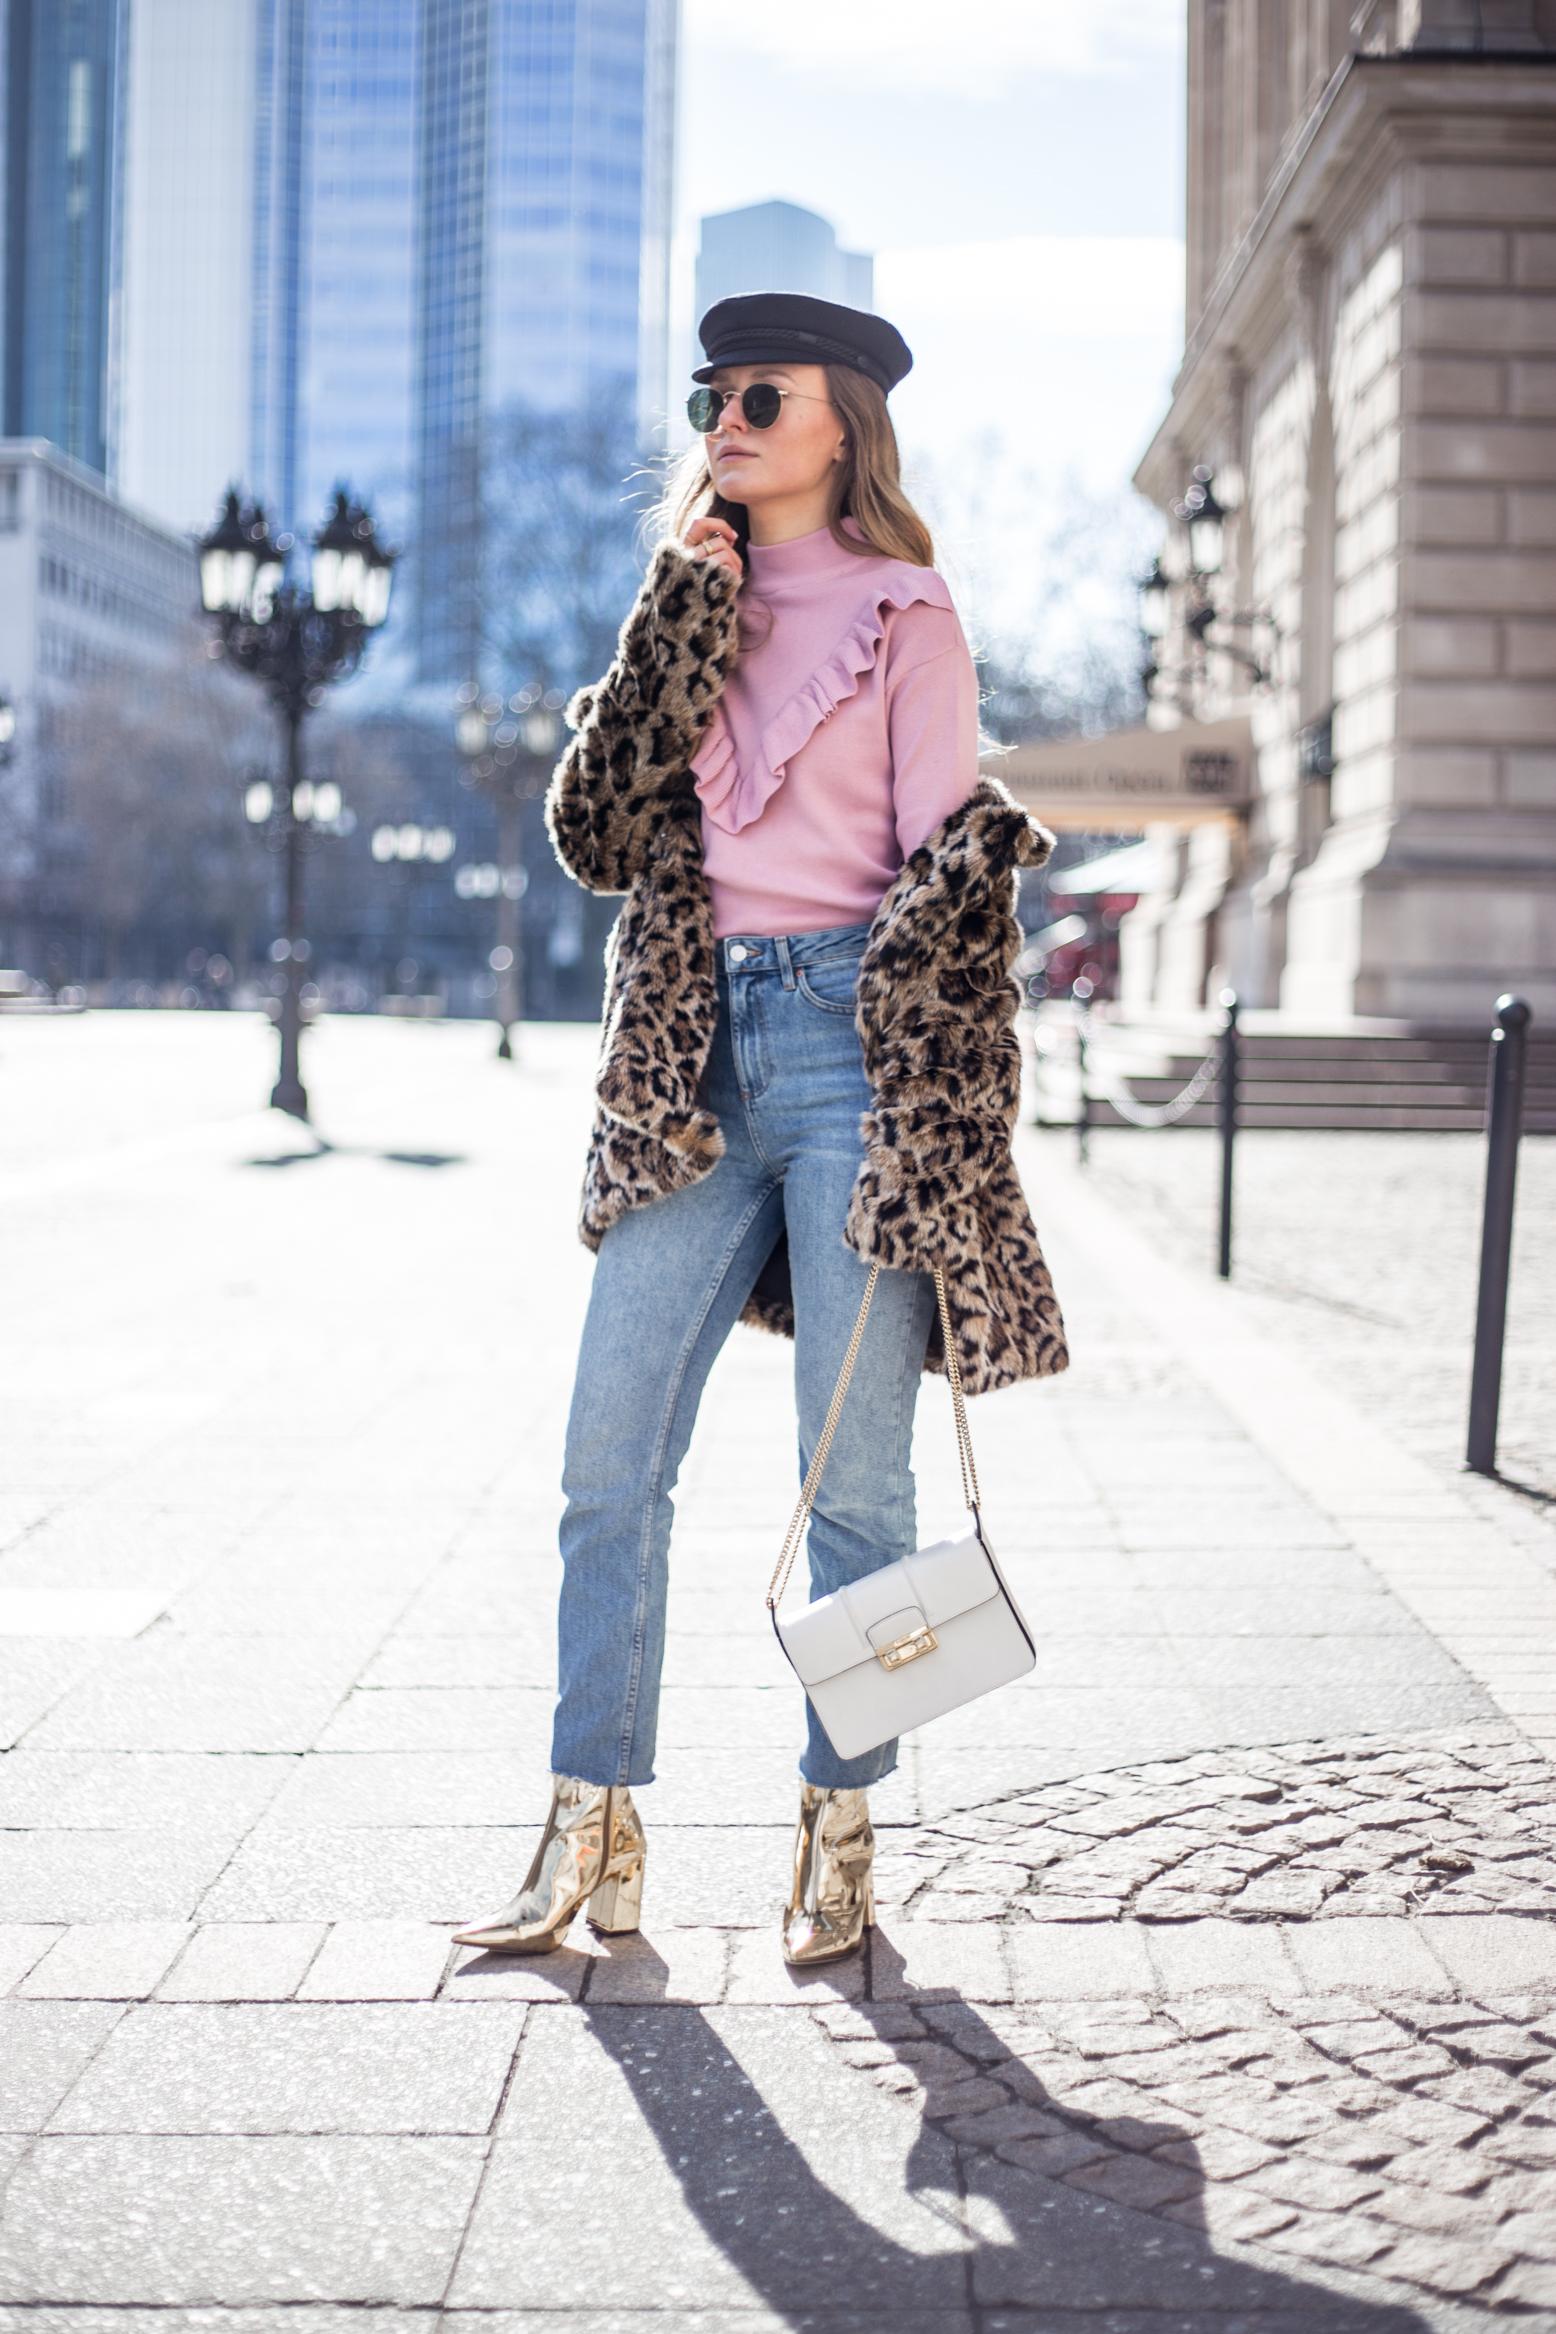 frill-knit-leopard-fake-fur-fiddler-cap-1495